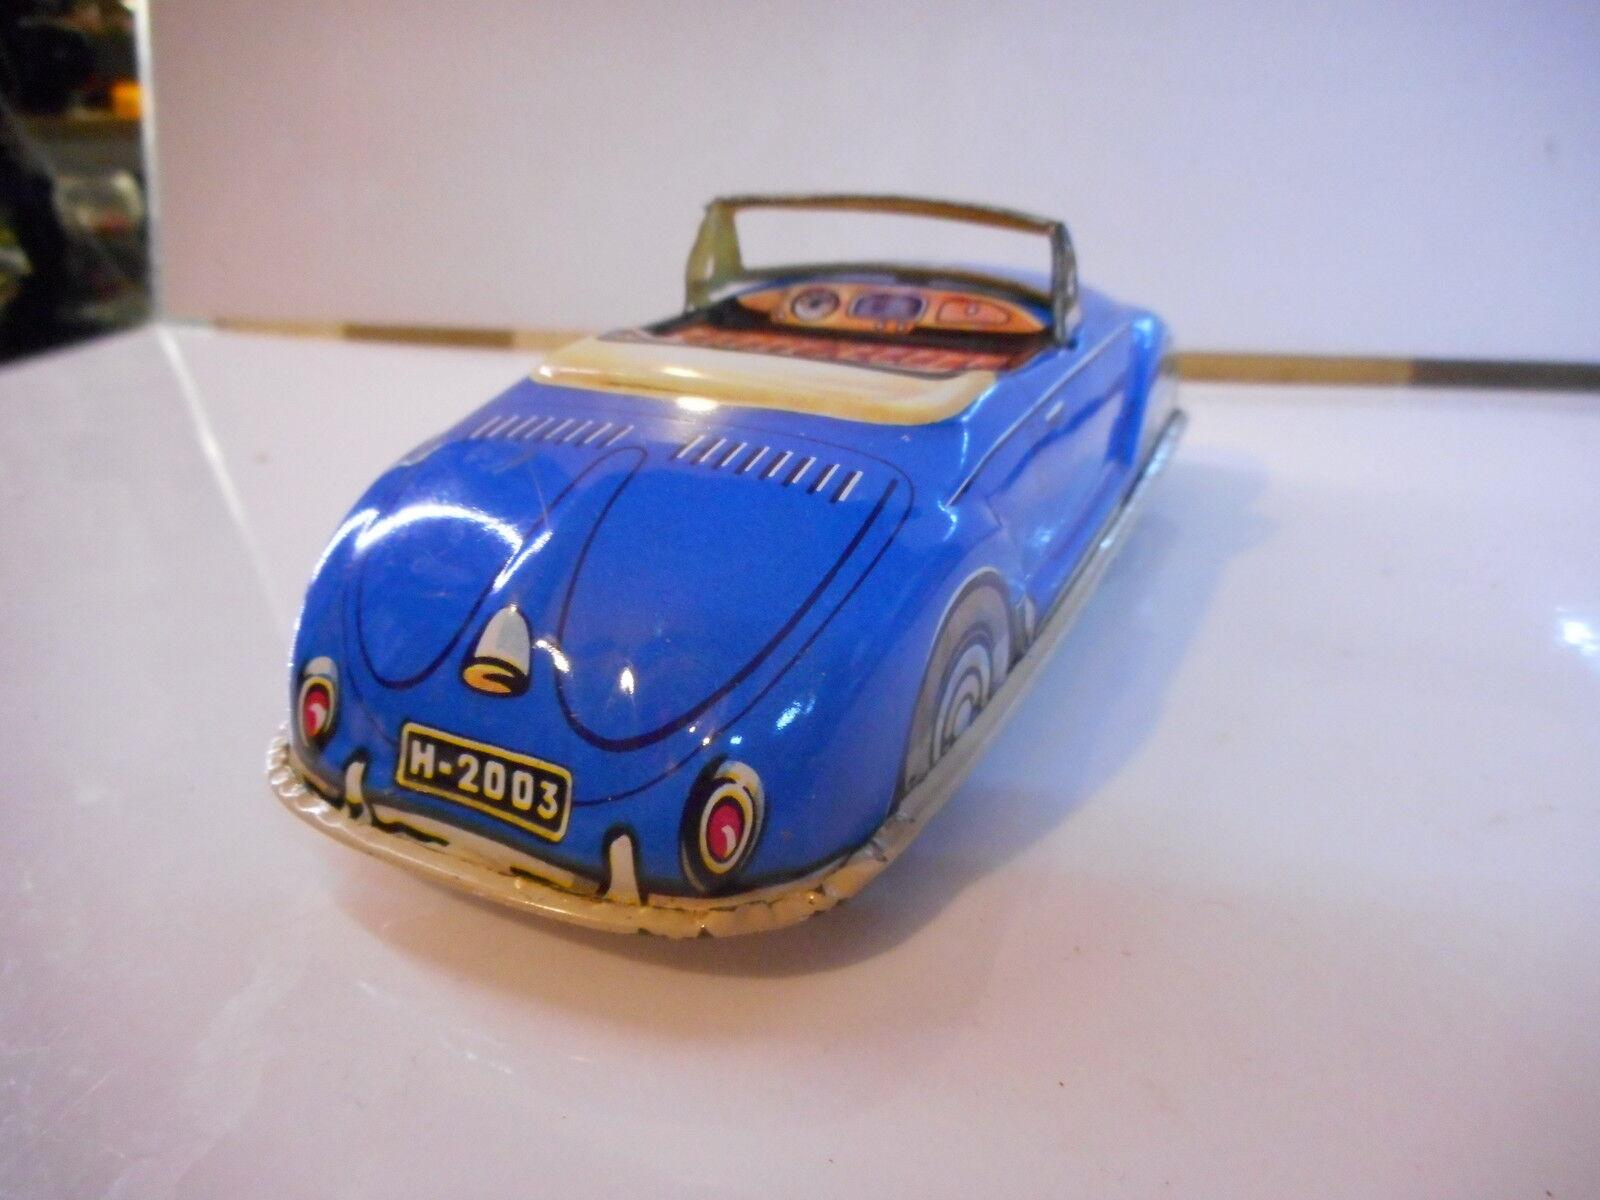 COX JOYAX VW VOLKSWAGEN COCCINELLE JOUET TOLE CAR CAR CAR TIN TOY  BEETLE KAFER FRICTION 1ad970